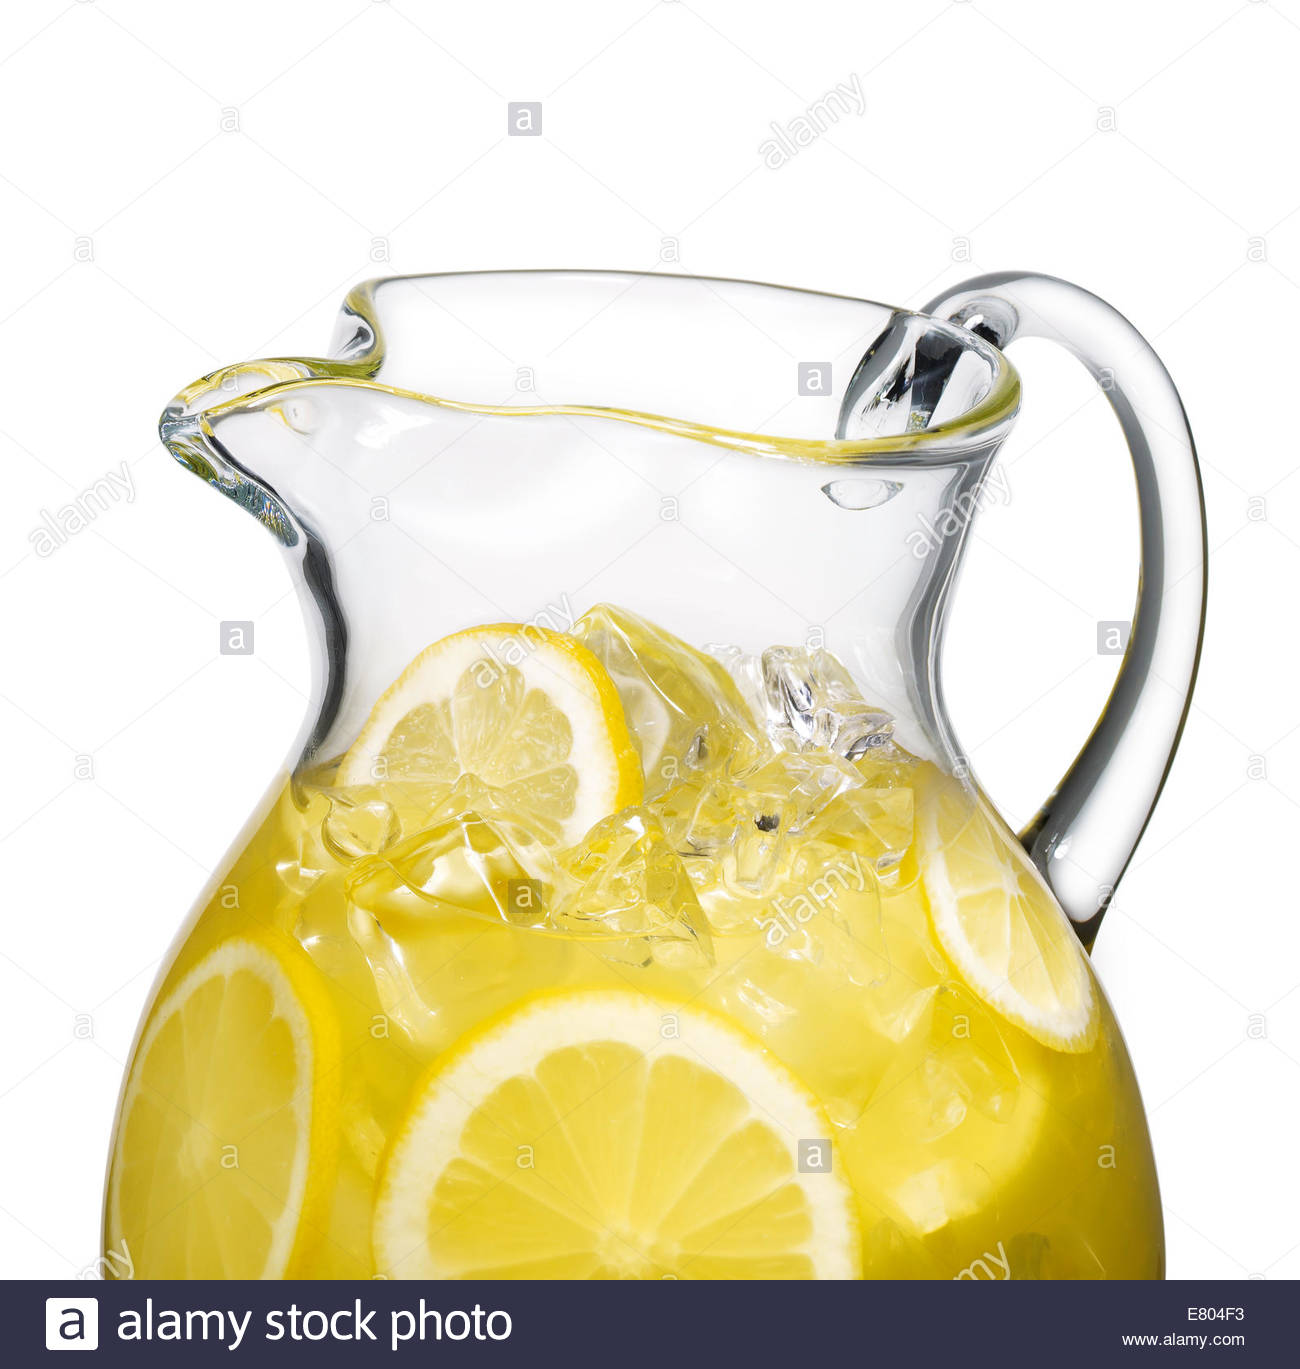 lemonade pitcher - photo #11